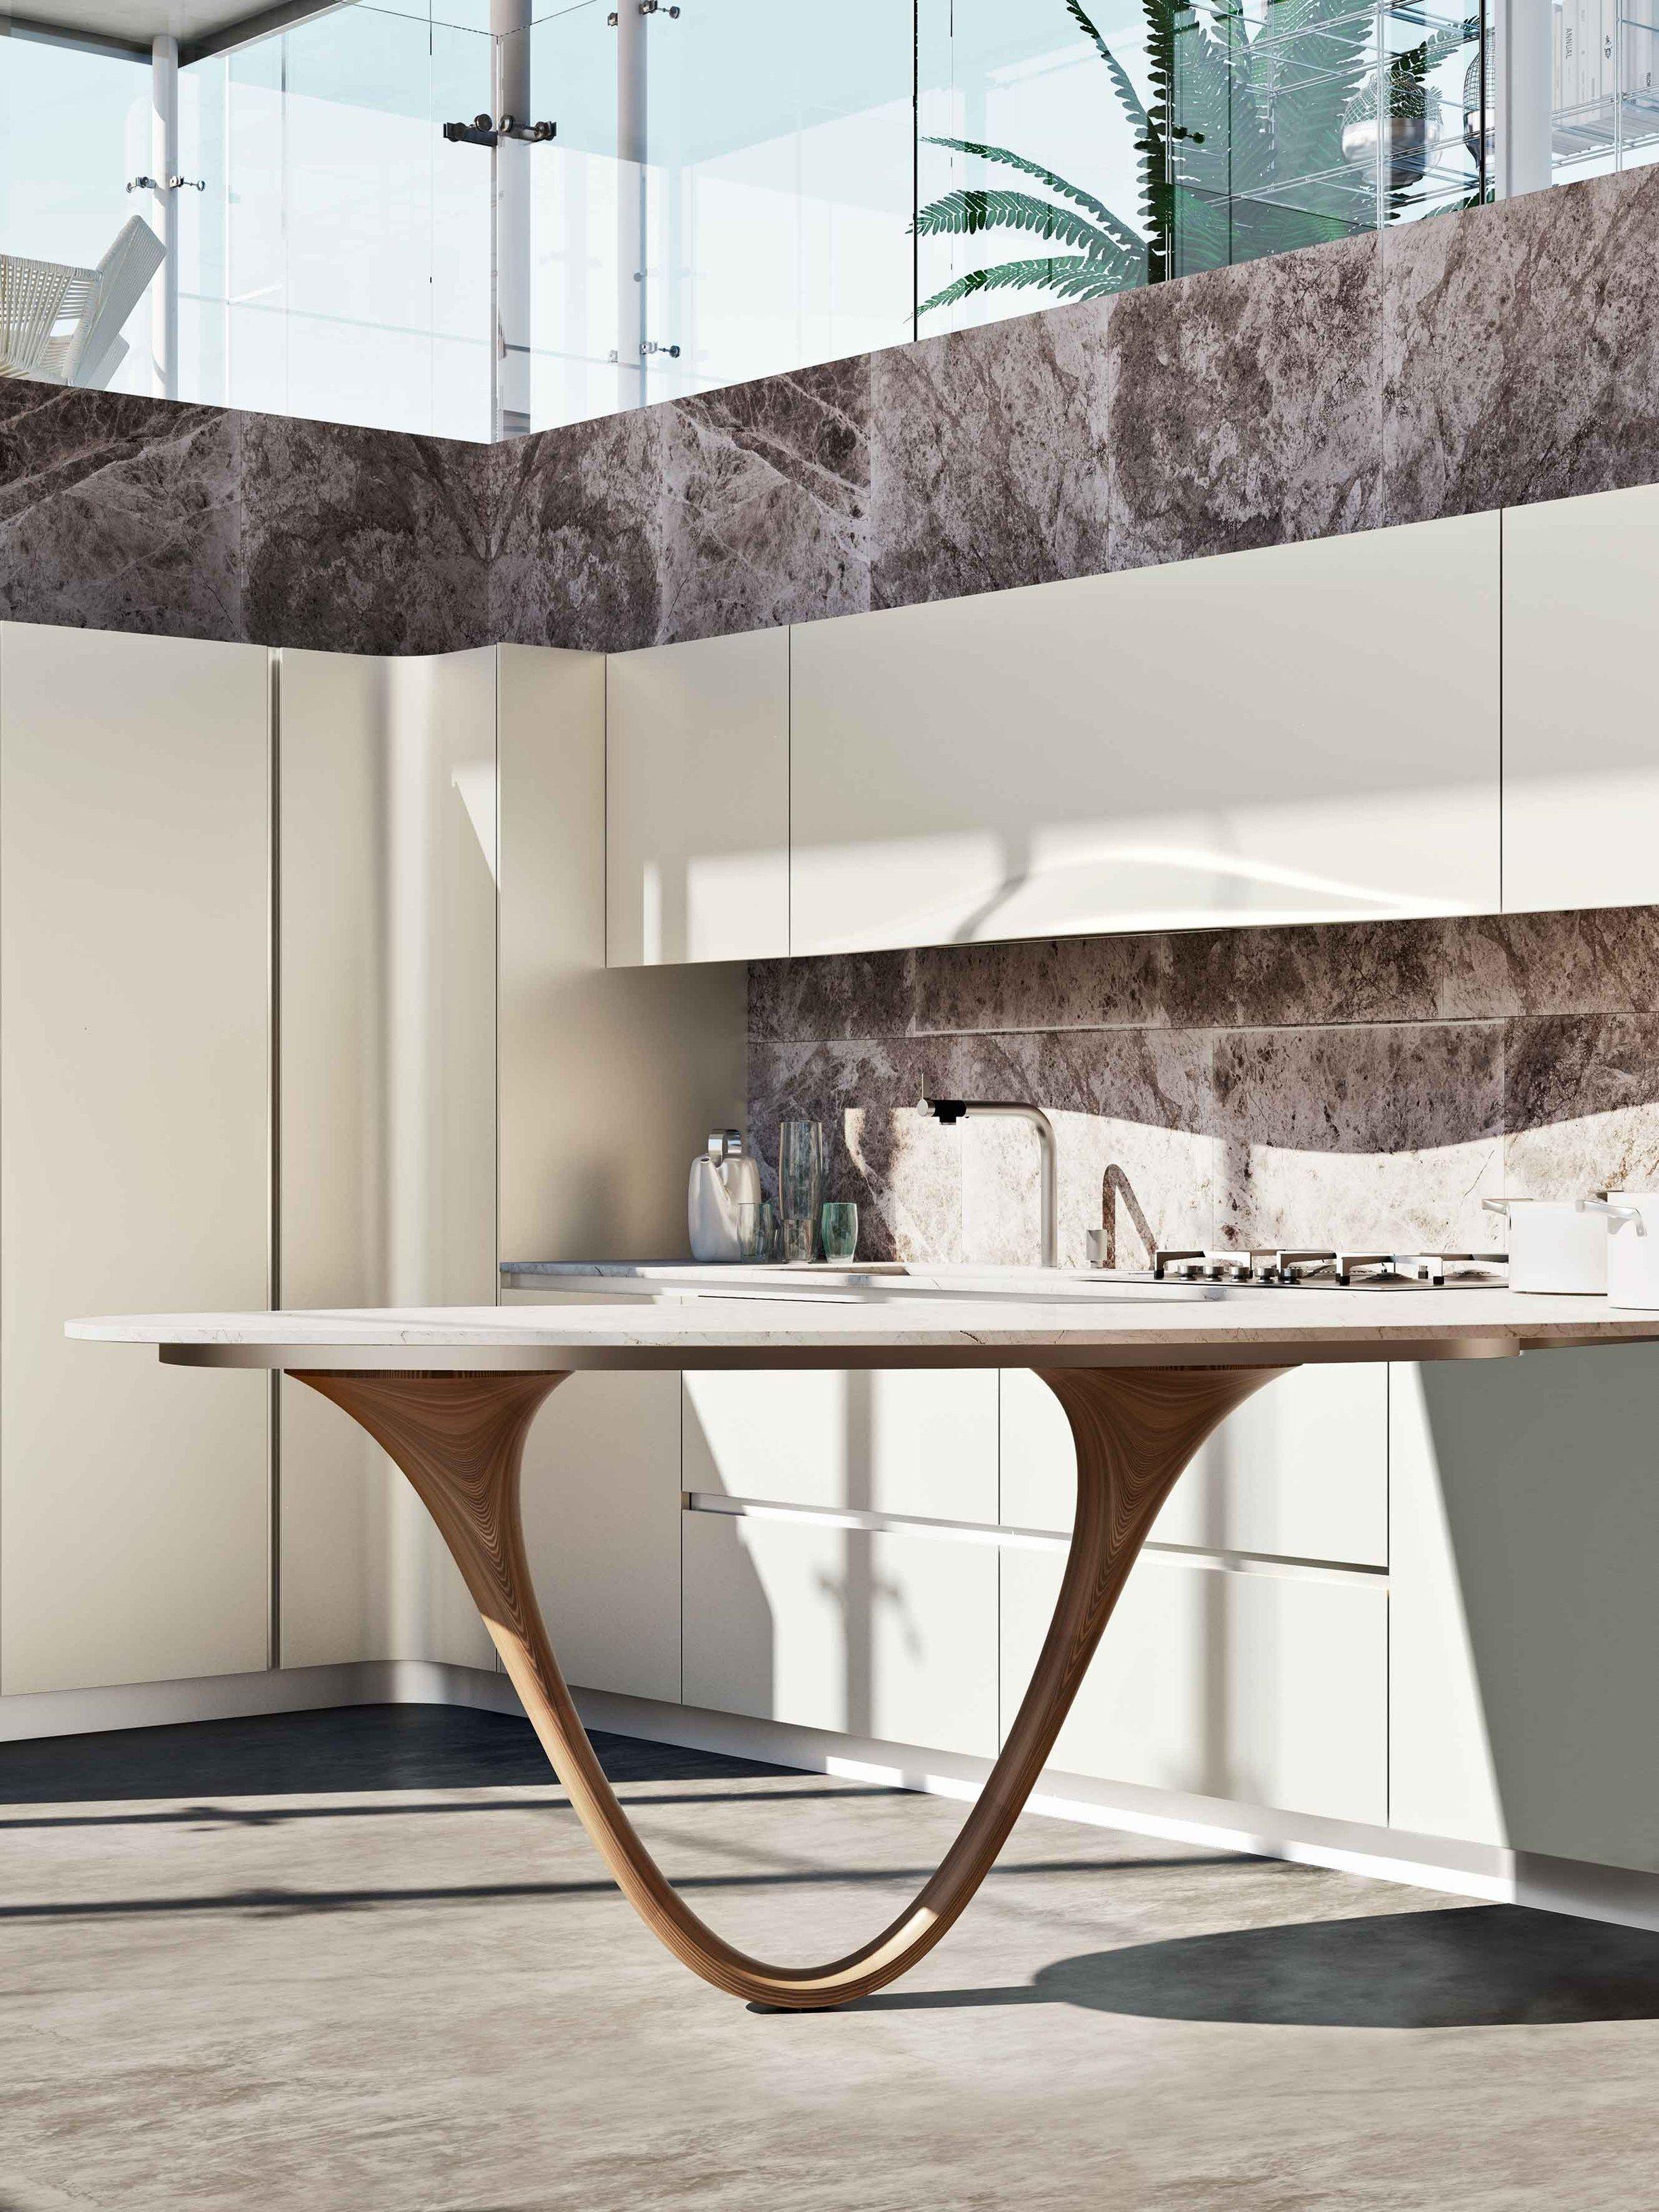 OLA 20 | Küche Mit Halbinsel Kollektion ICONE By Snaidero Design Pininfarina